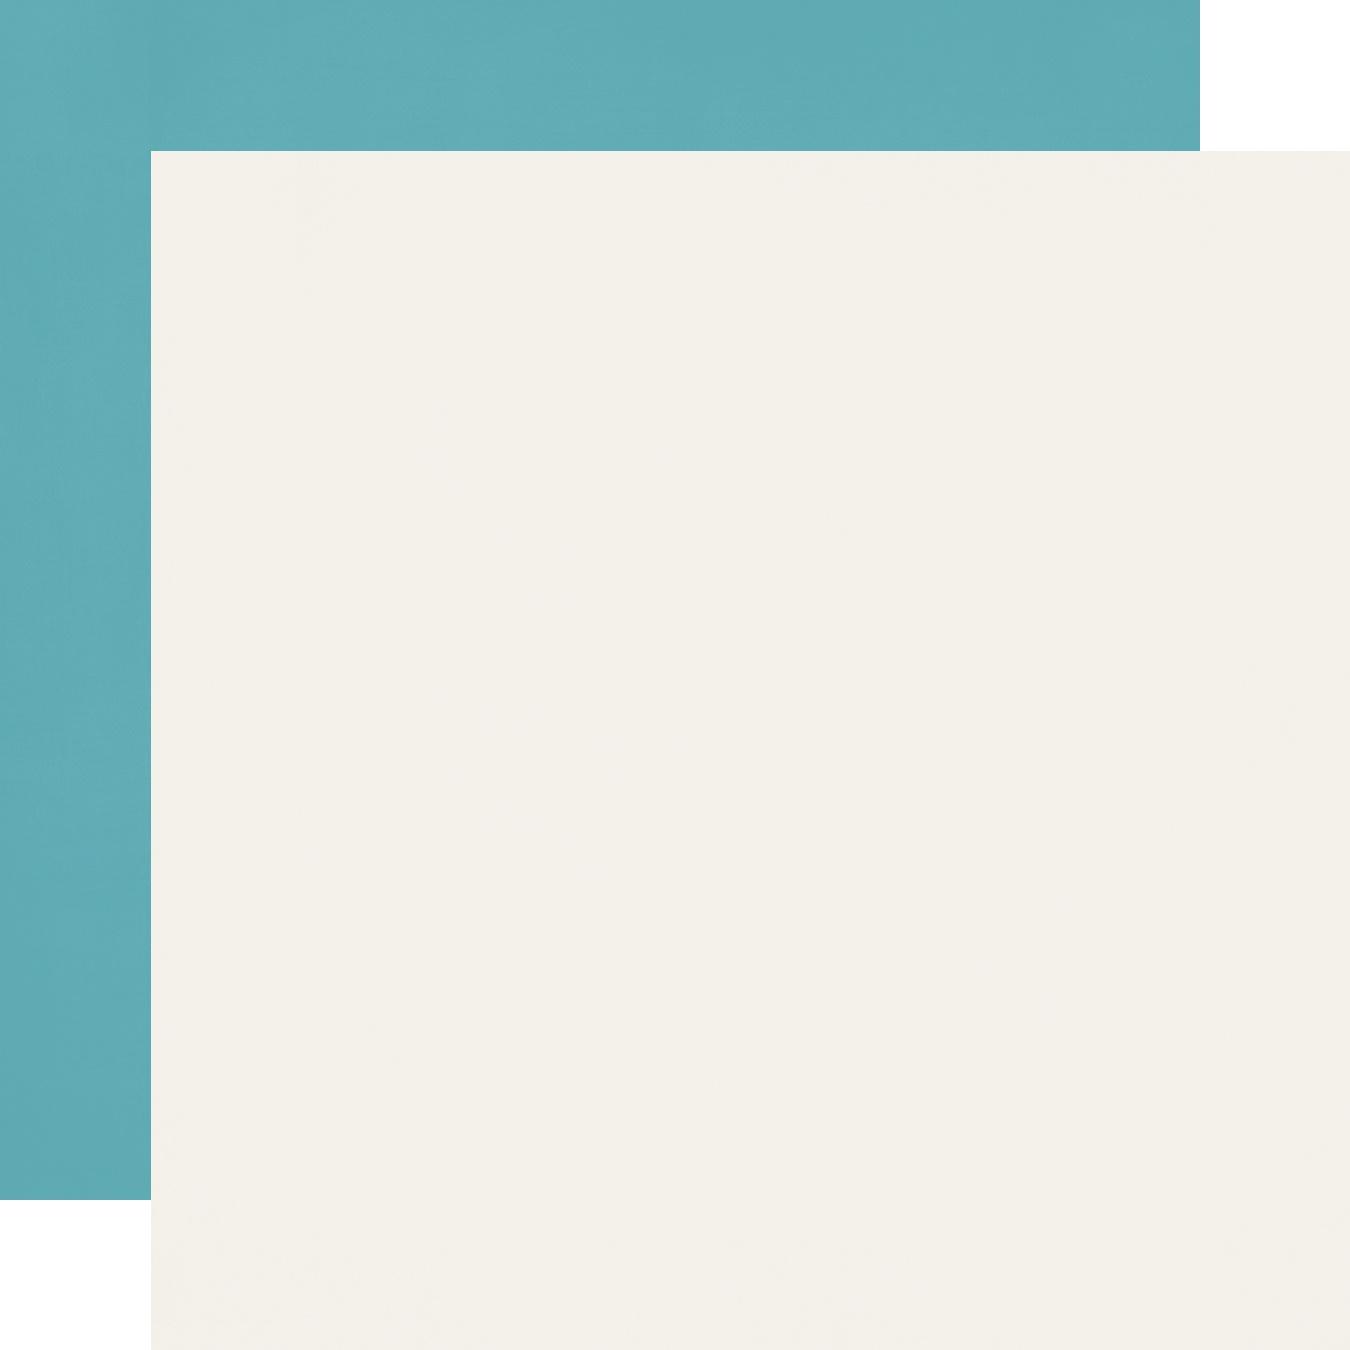 Cruisin' Double-Sided Cardstock 12X12-Teal/Cream Simple Basic